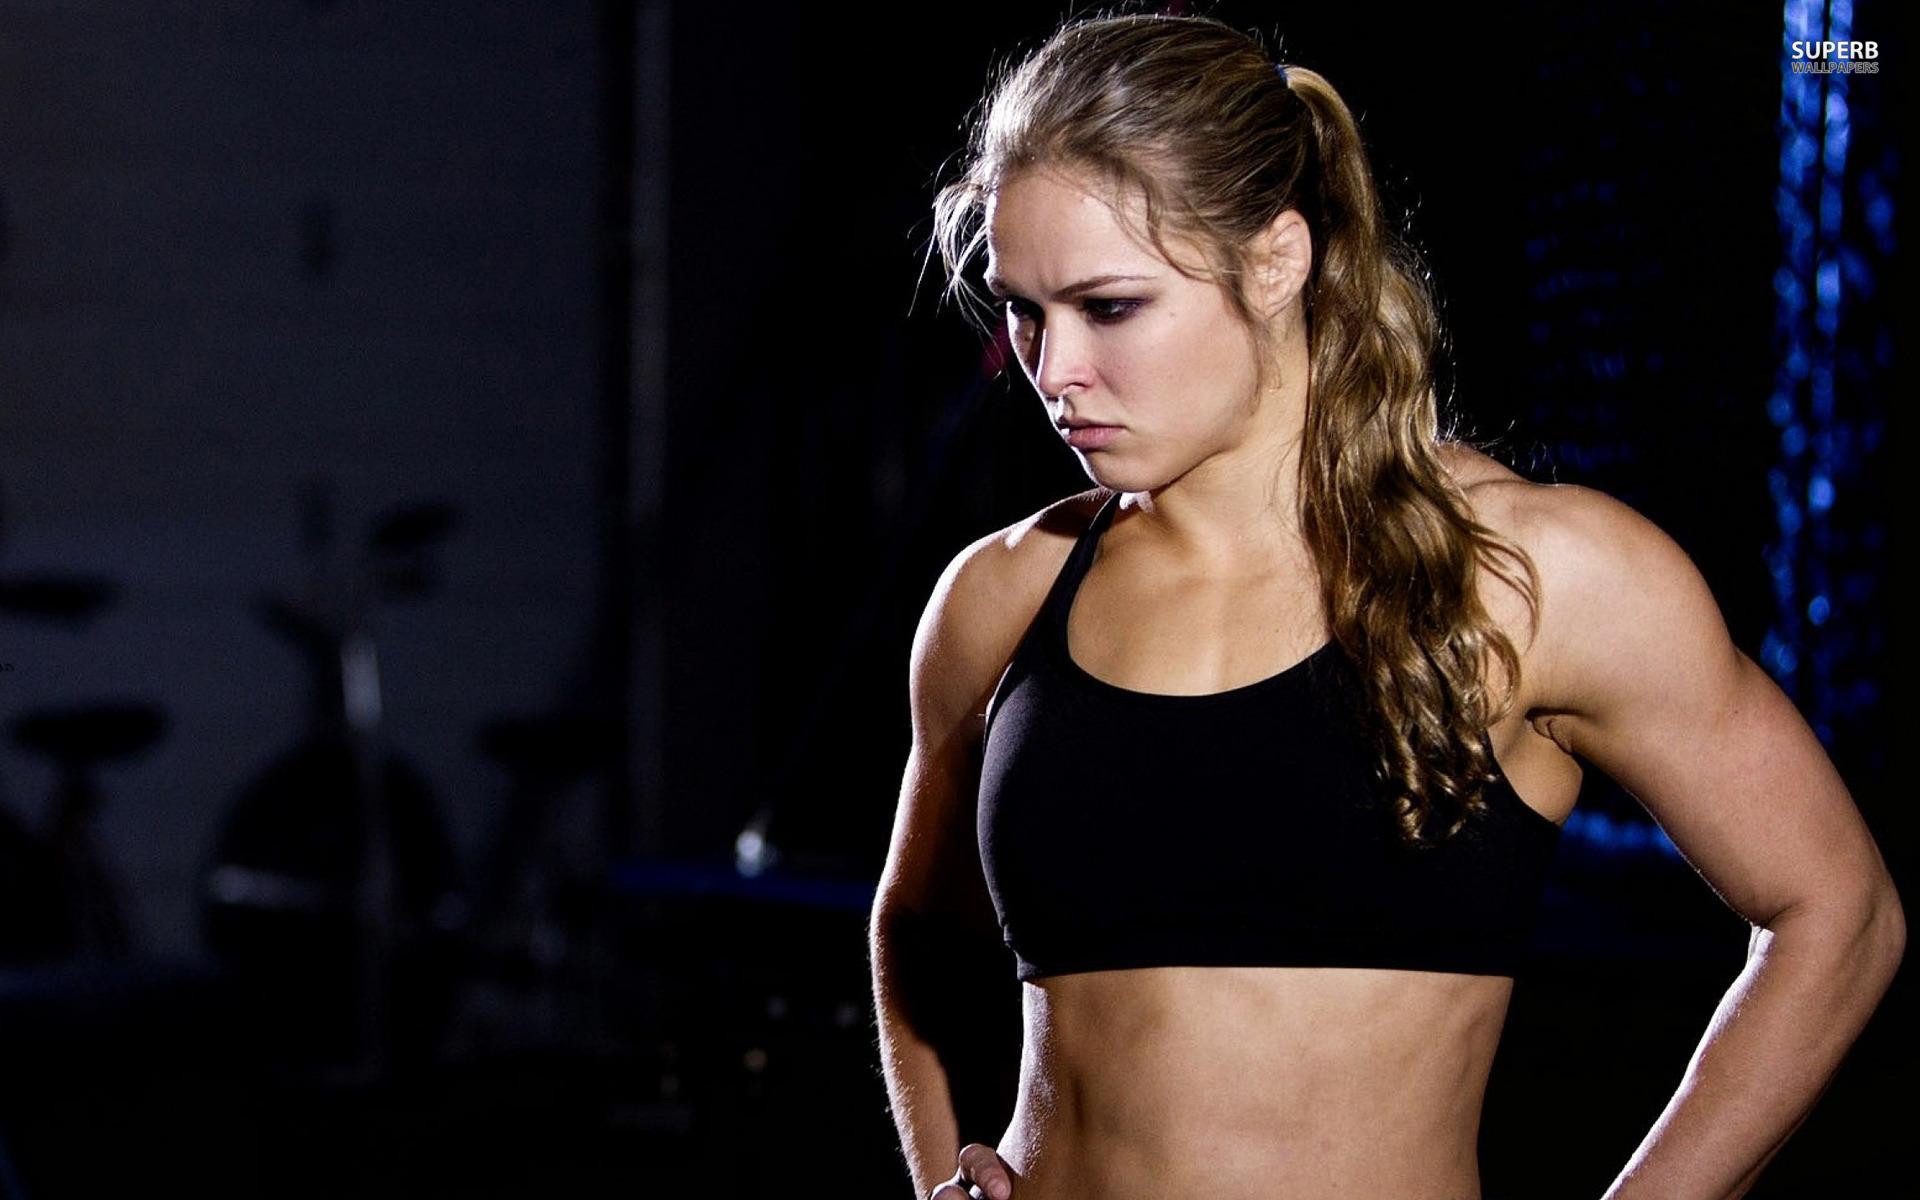 Ronda Rousey Widescreen Wallpaper